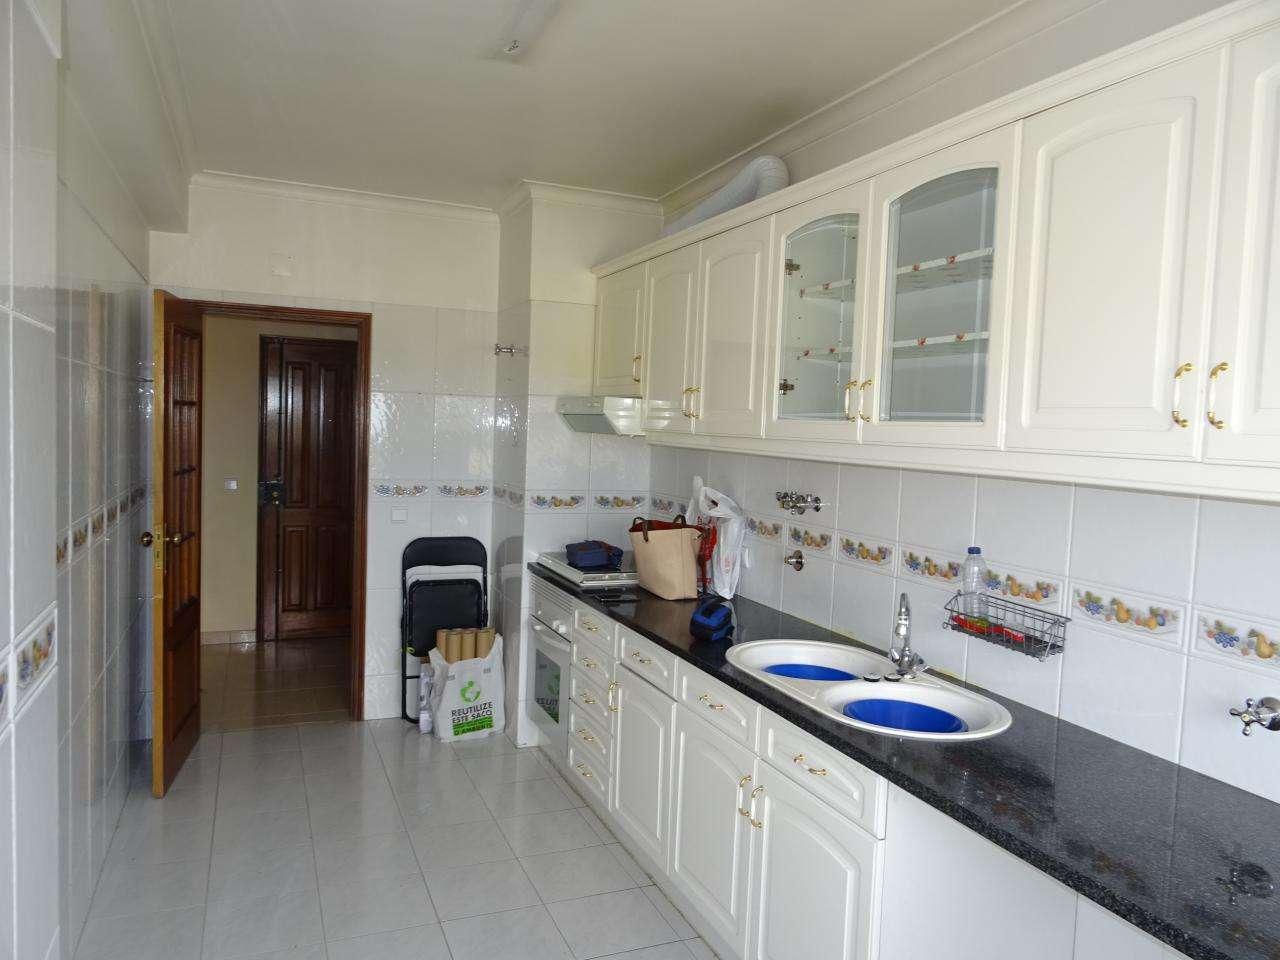 Apartamento para comprar, Porto Salvo, Oeiras, Lisboa - Foto 2